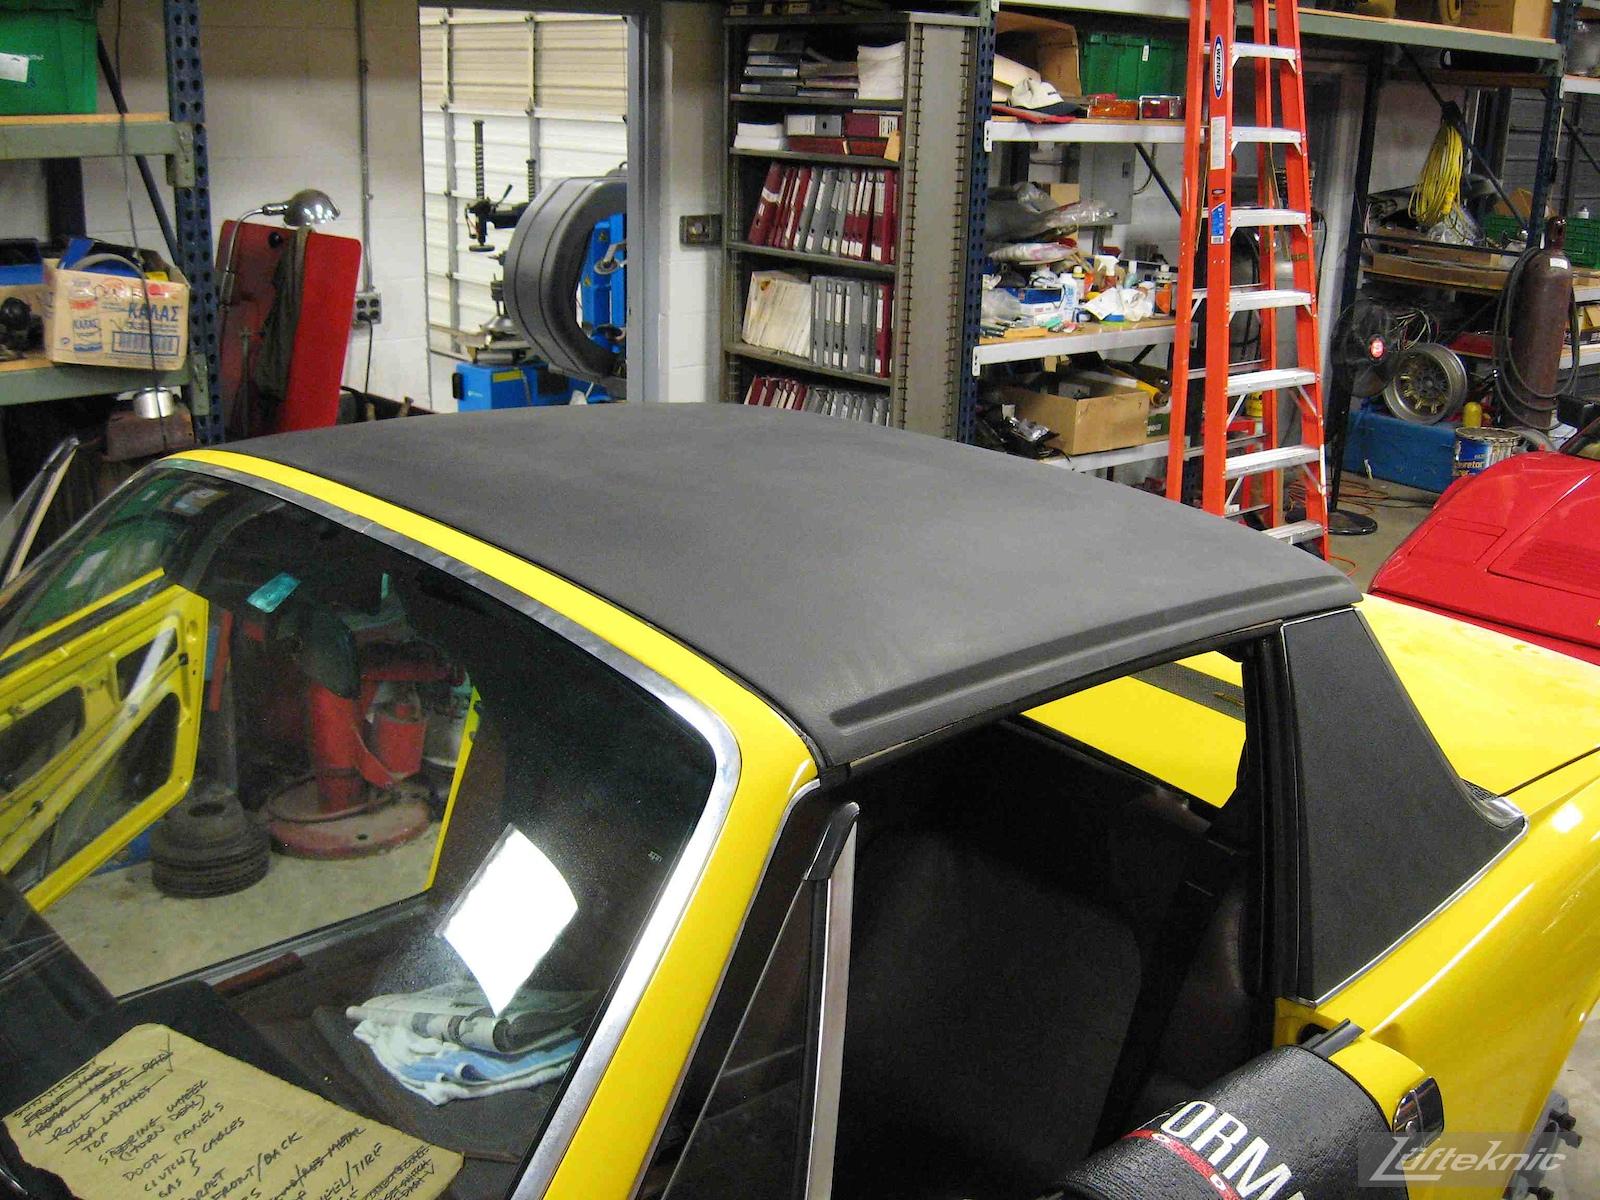 New top on a restored yellow Porsche 914 at Lufteknic.